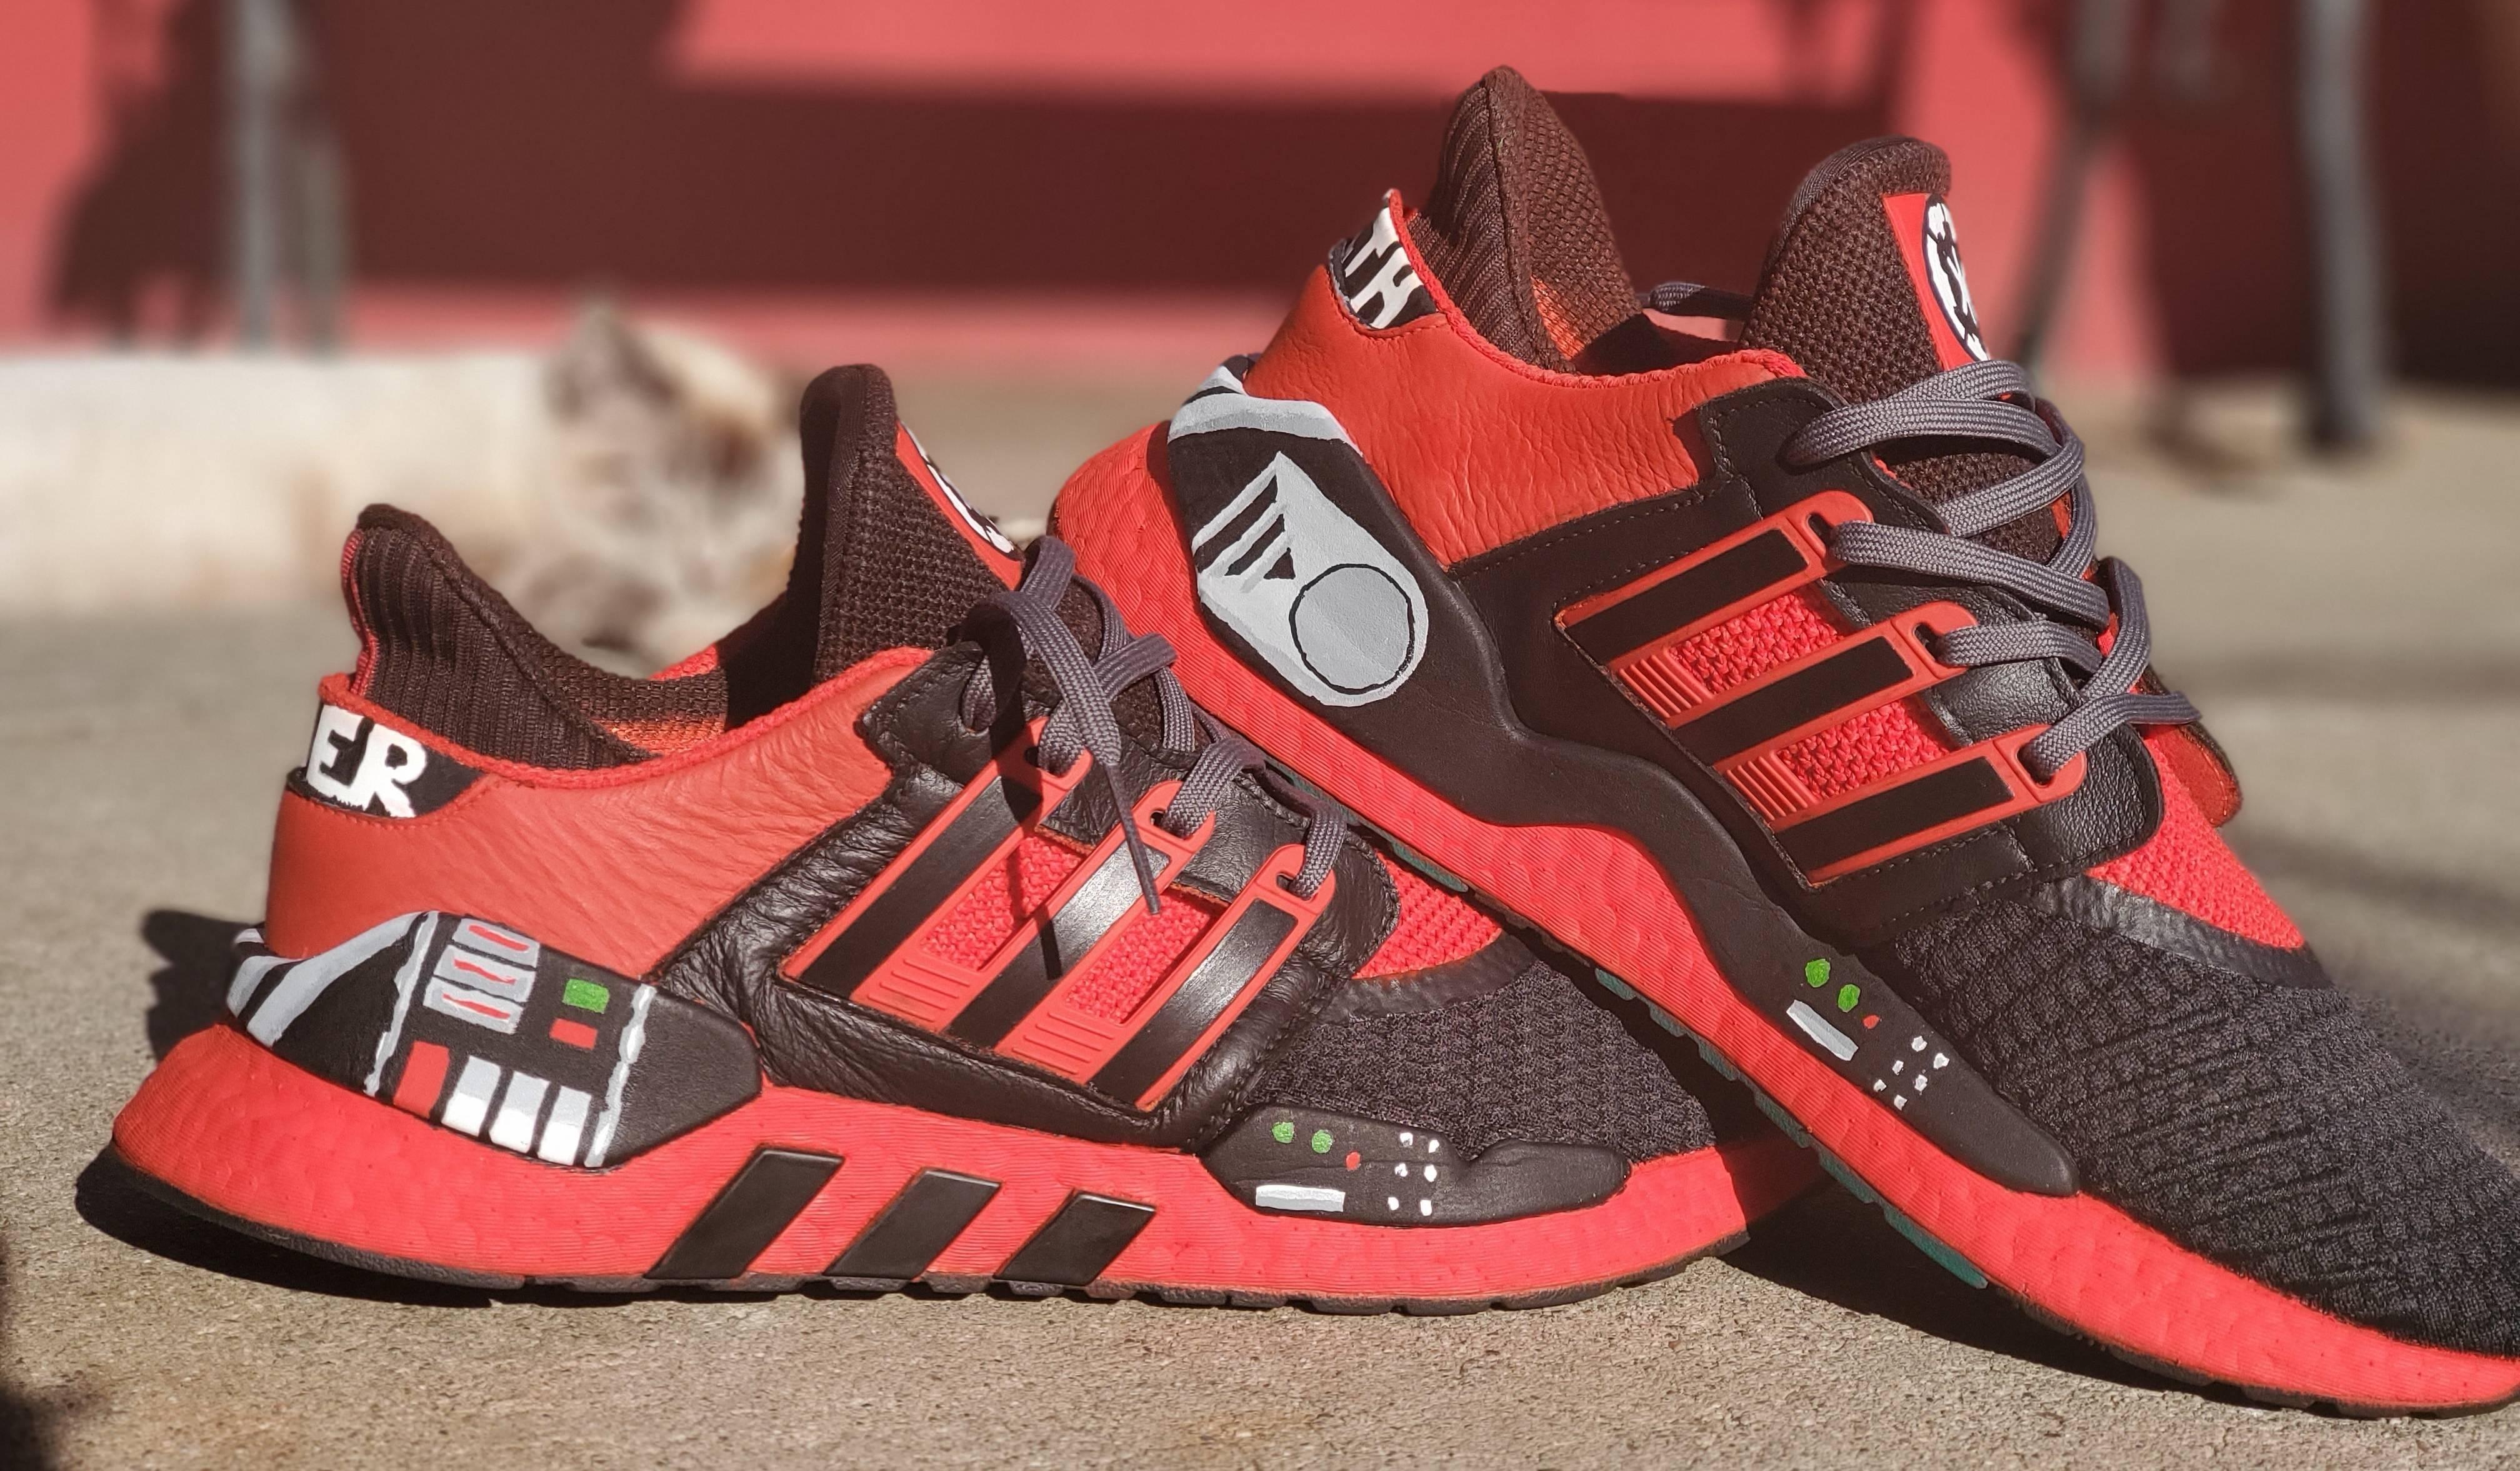 Darth Vader quarantined custom painted shoes